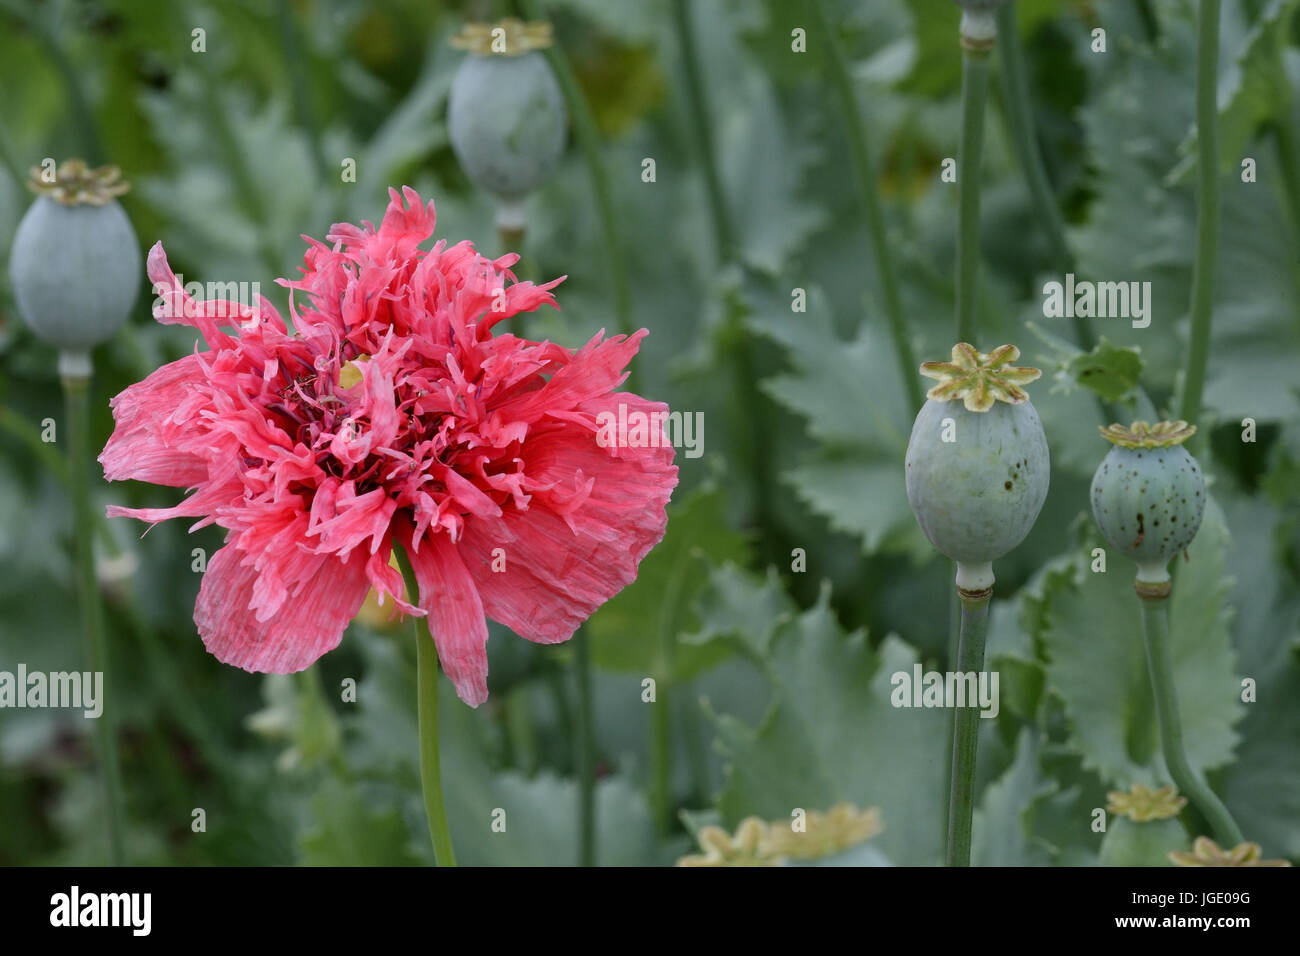 Sleeping poppy, Schlaf-Mohn - Stock Image